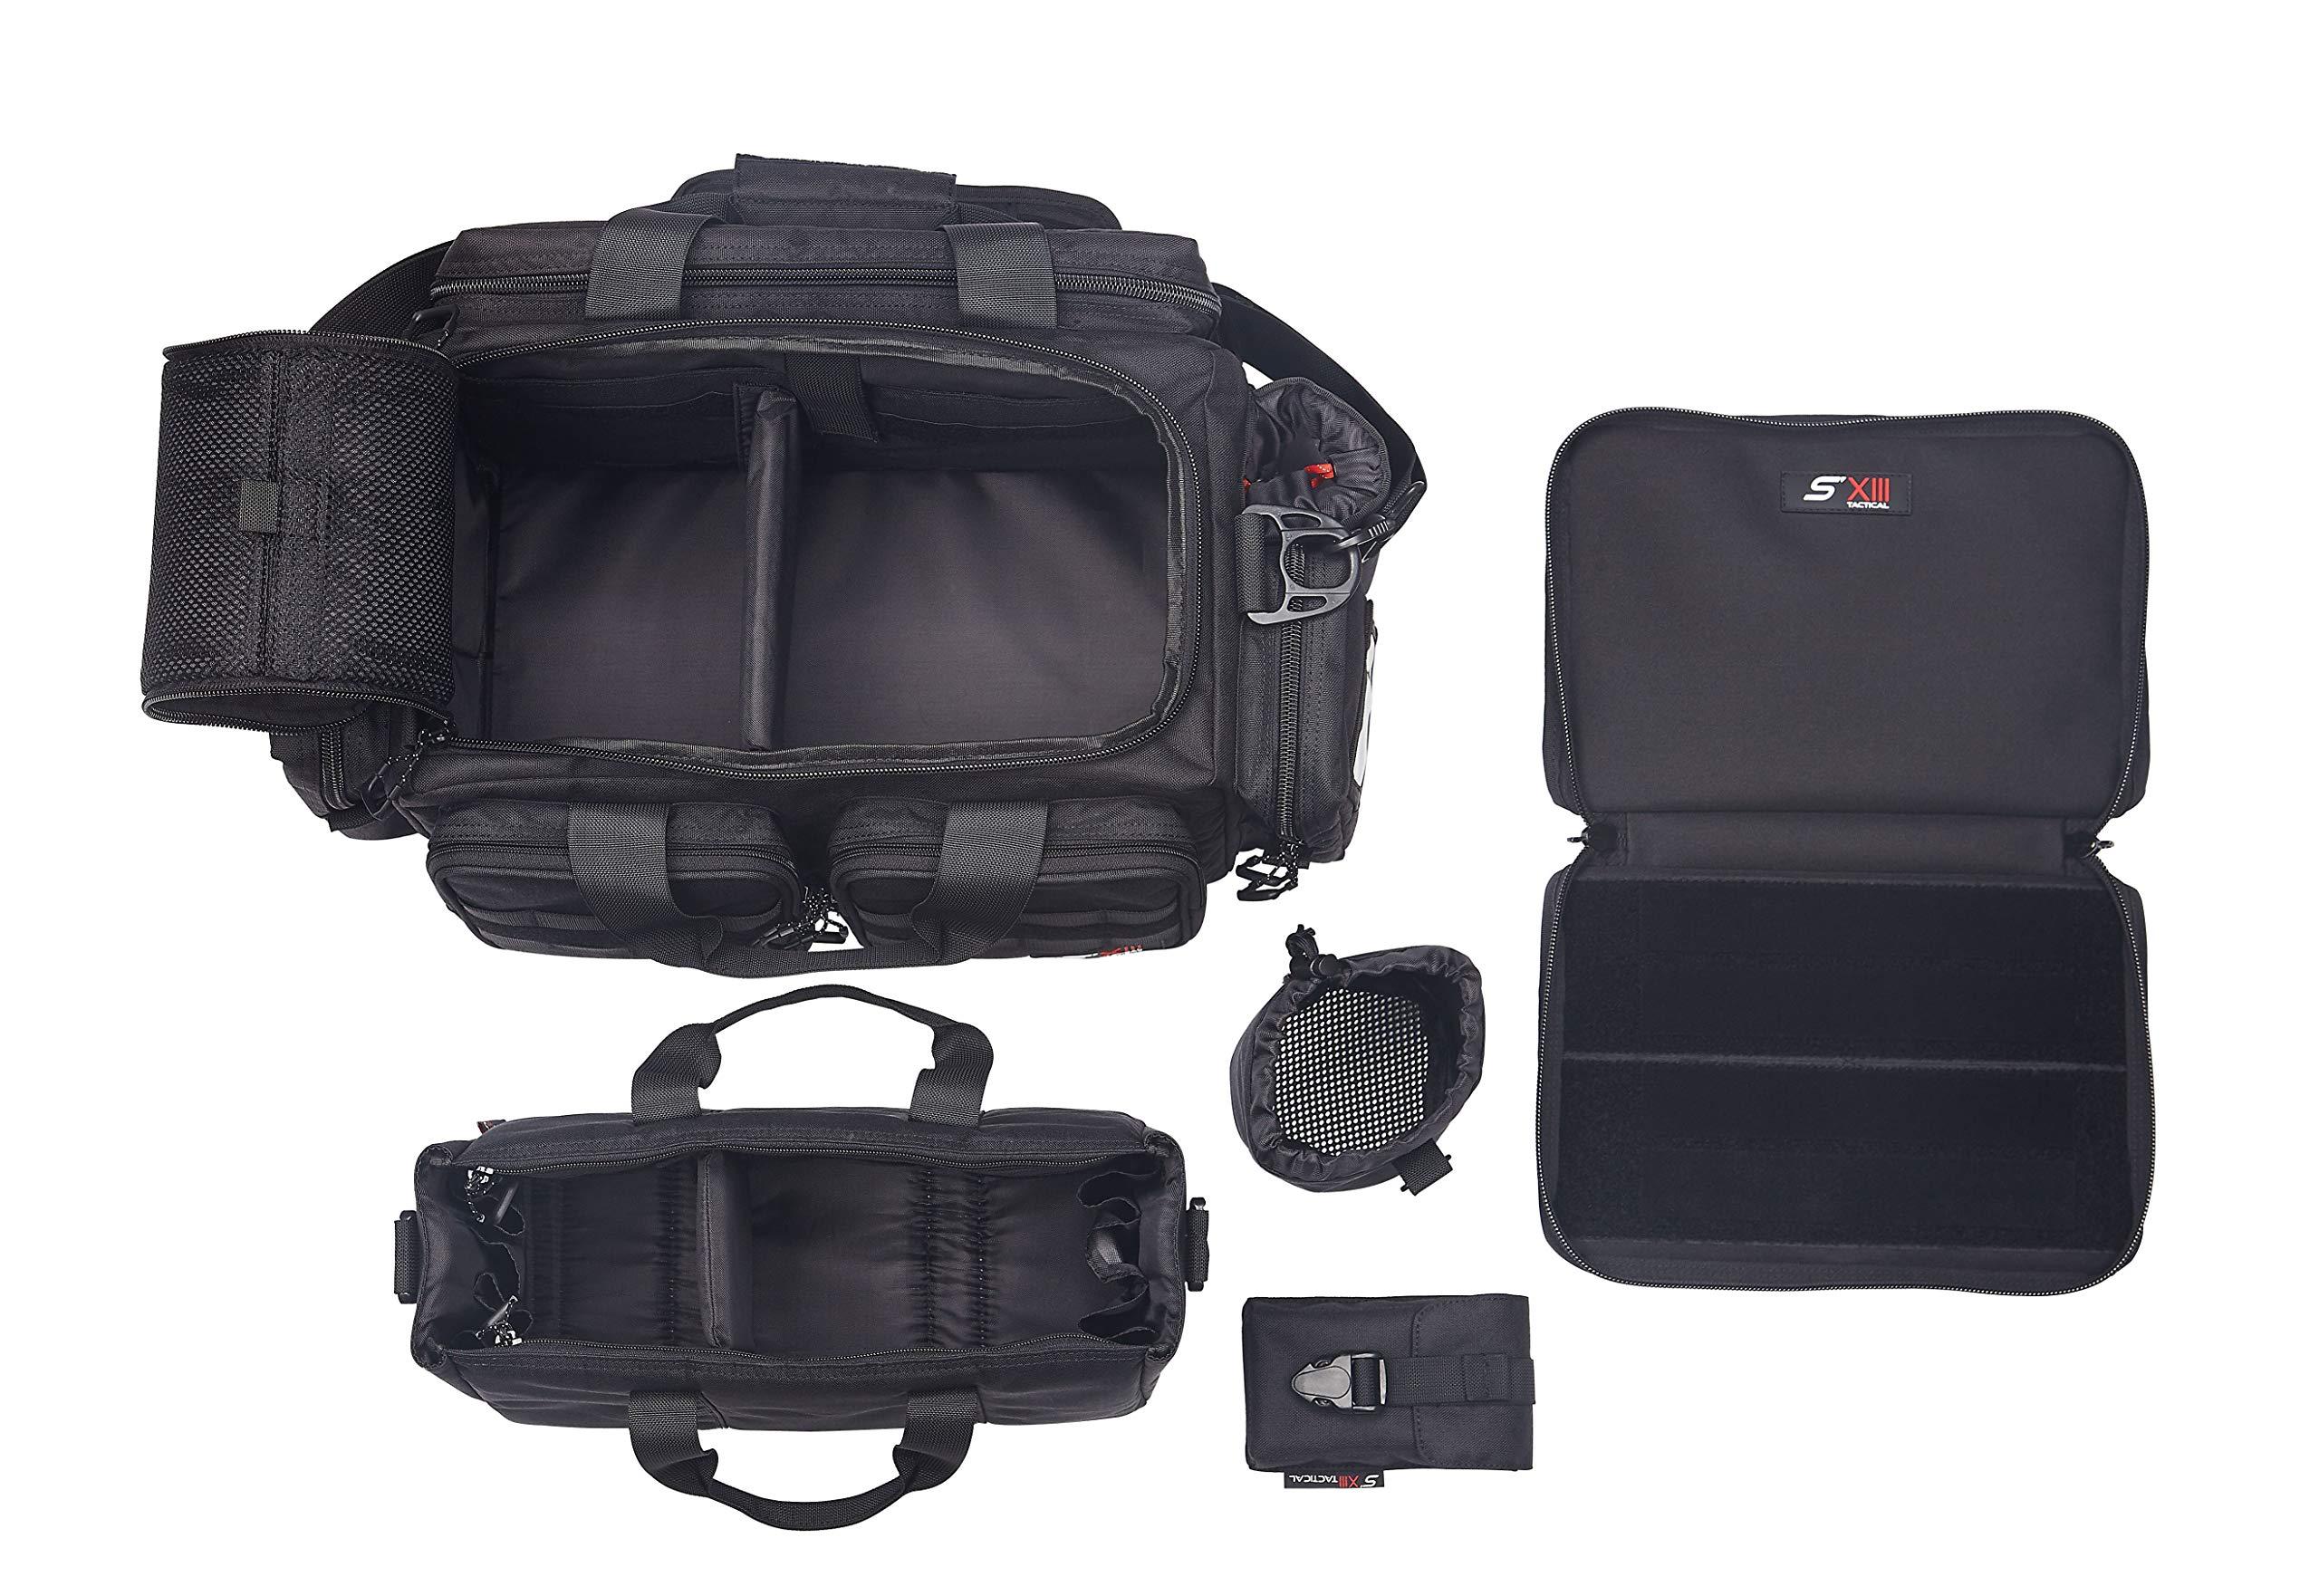 SXIII S13 RB1-BLK 1000D Ballistic Denier Tactical Pistol Range Bag (Black)